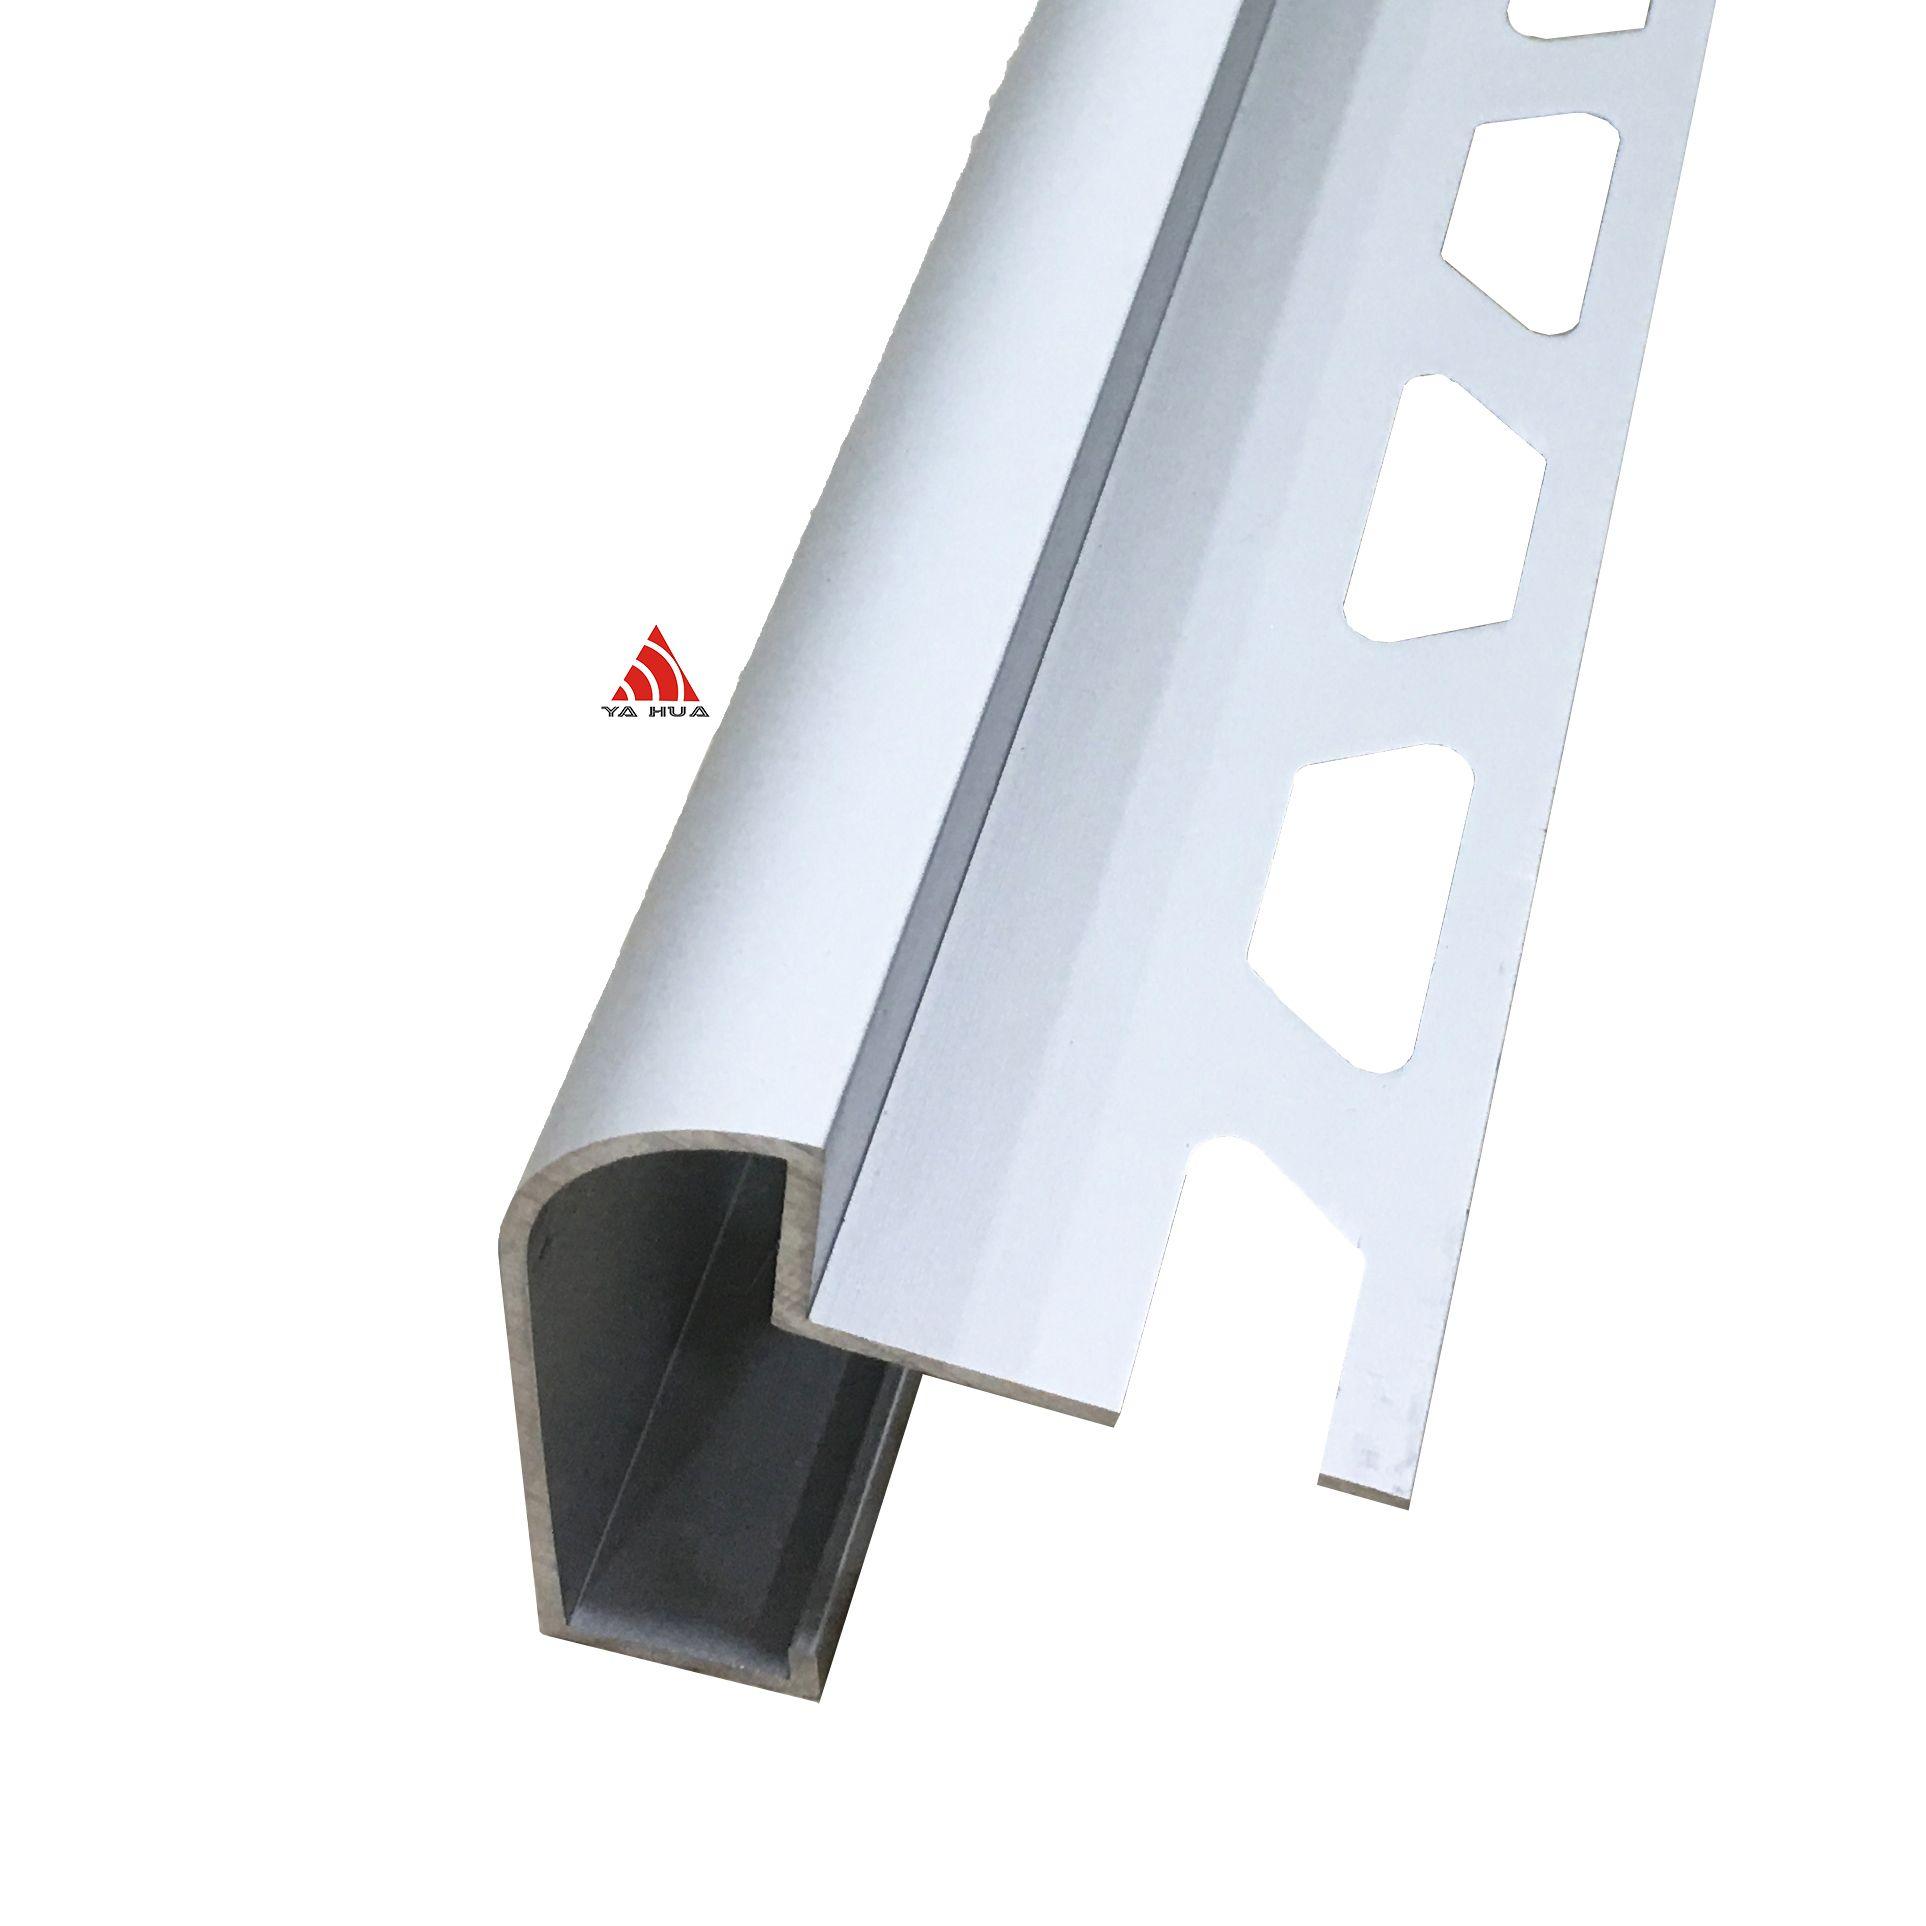 Stair Nosing For Ceramic  FD